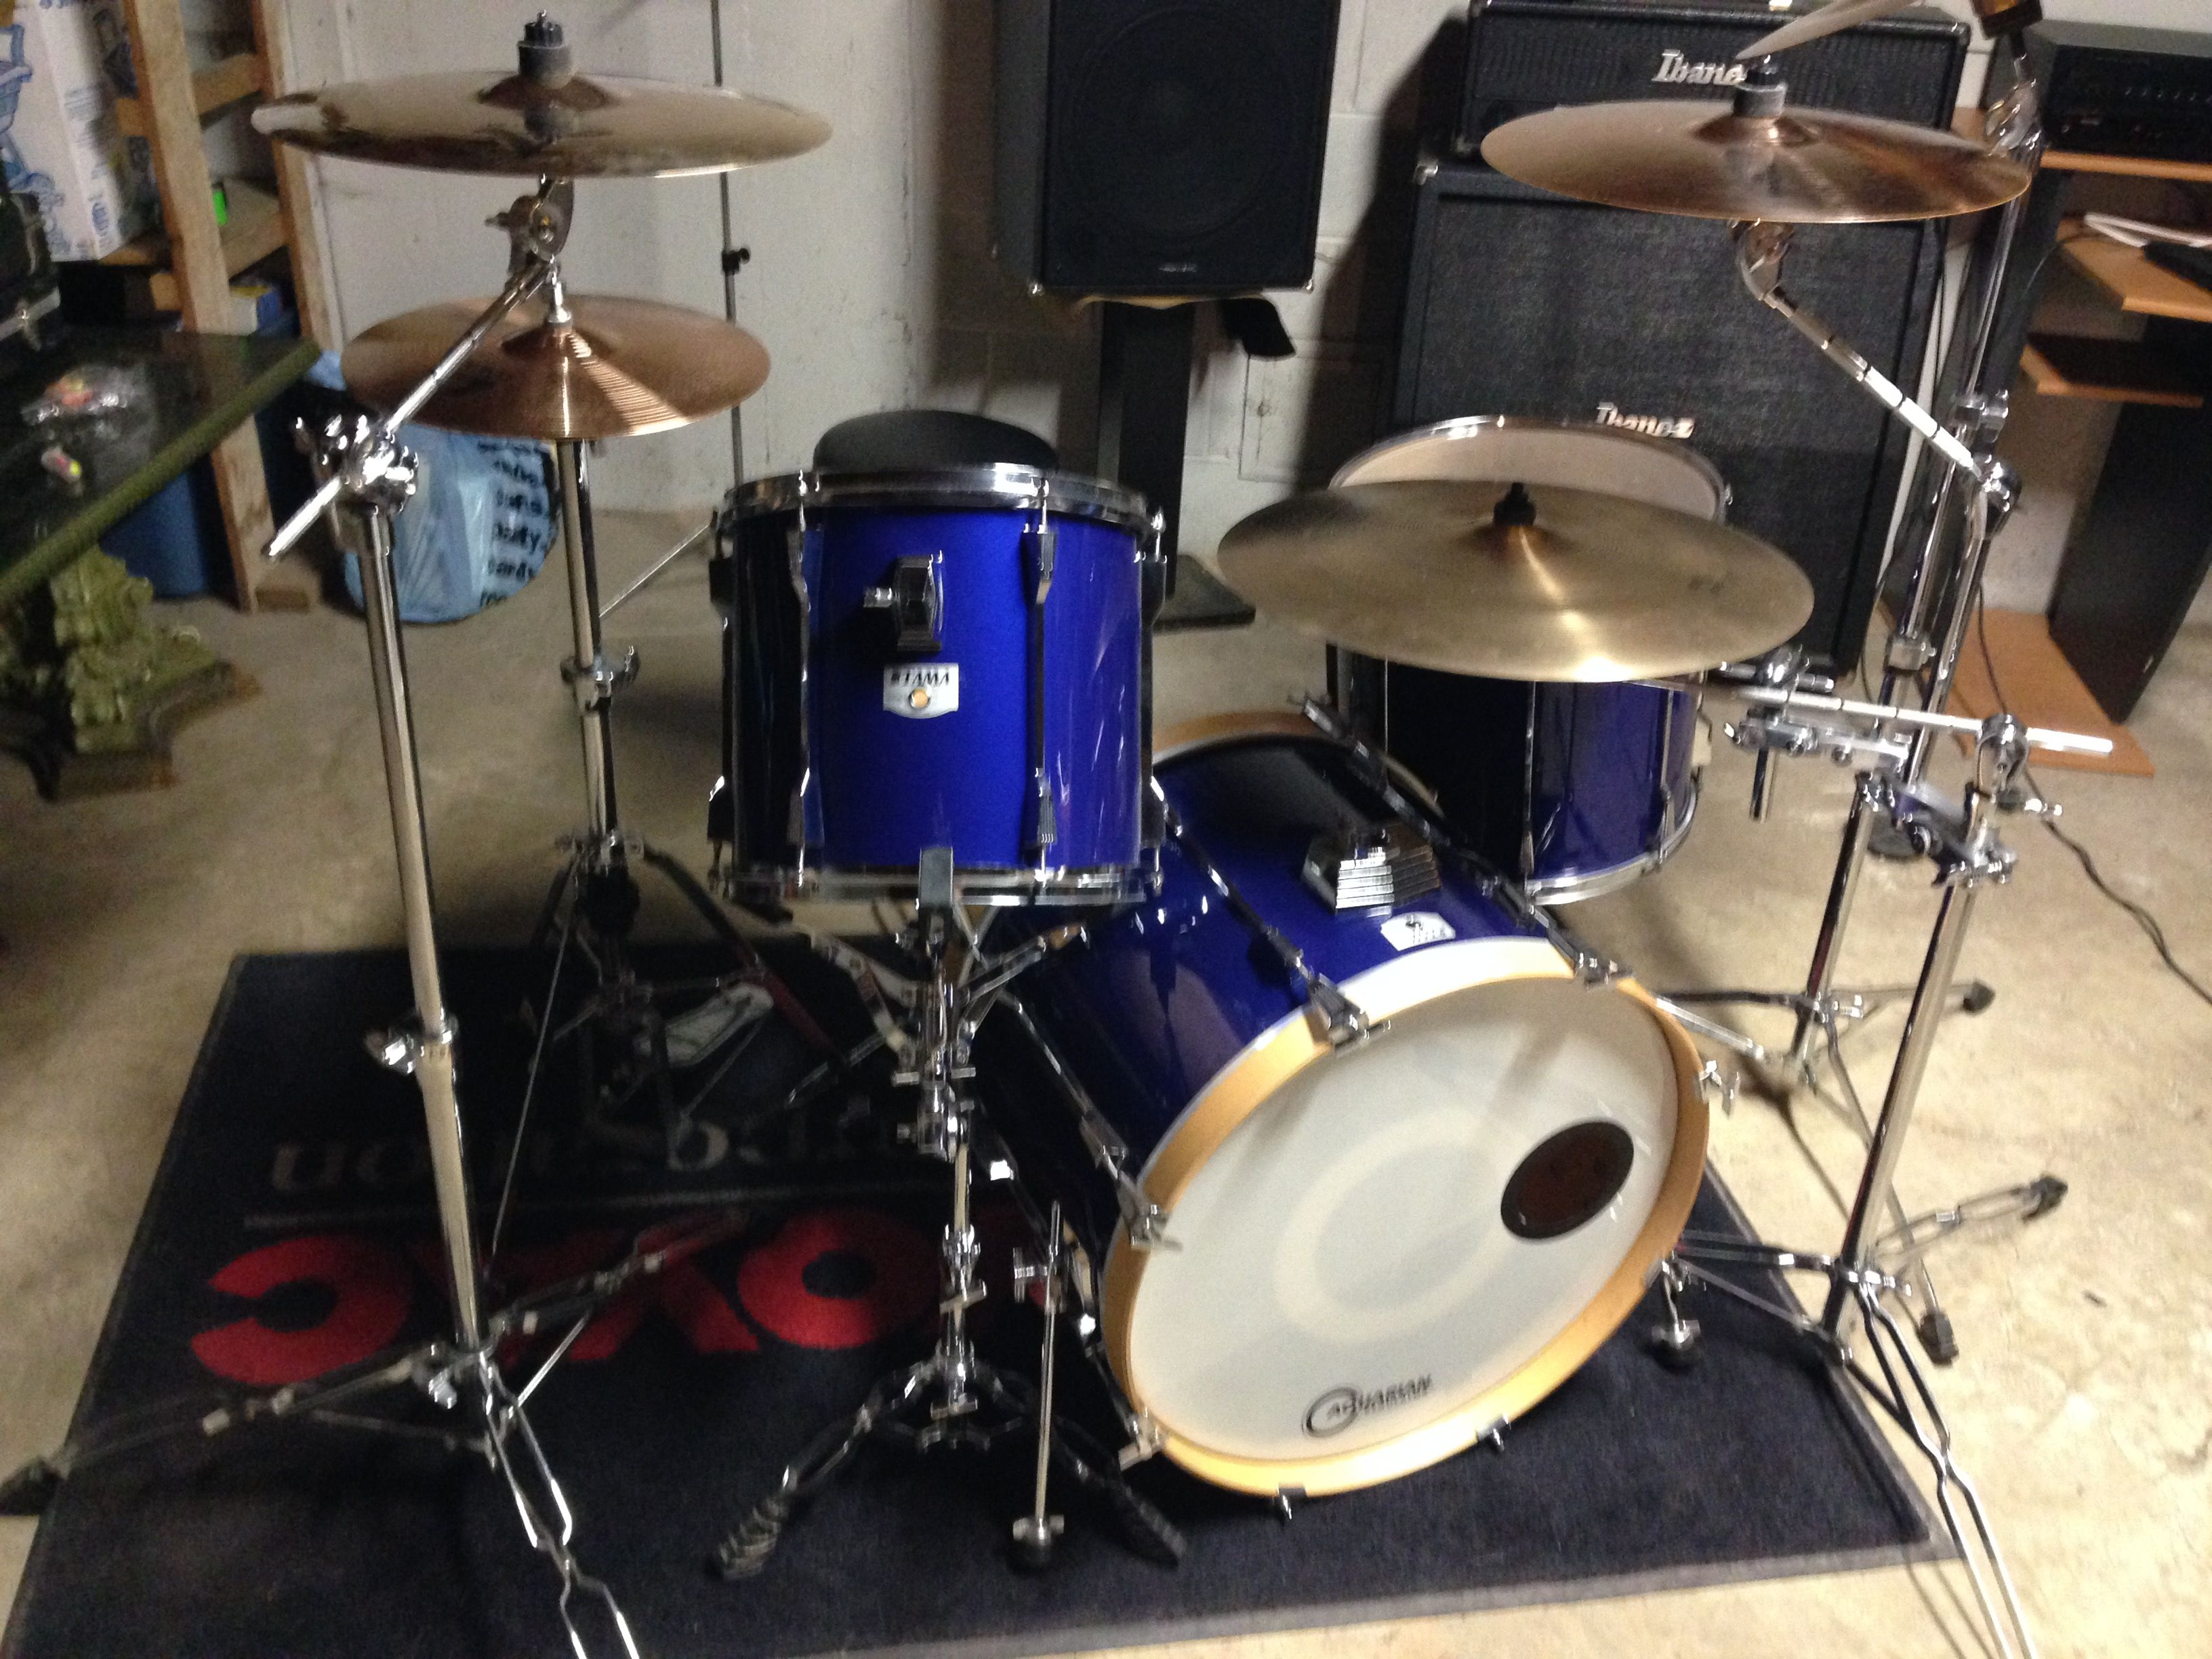 Bateria Musica Porno drum set/ minimal drum set/ paiste cymbals/sabian cymbals